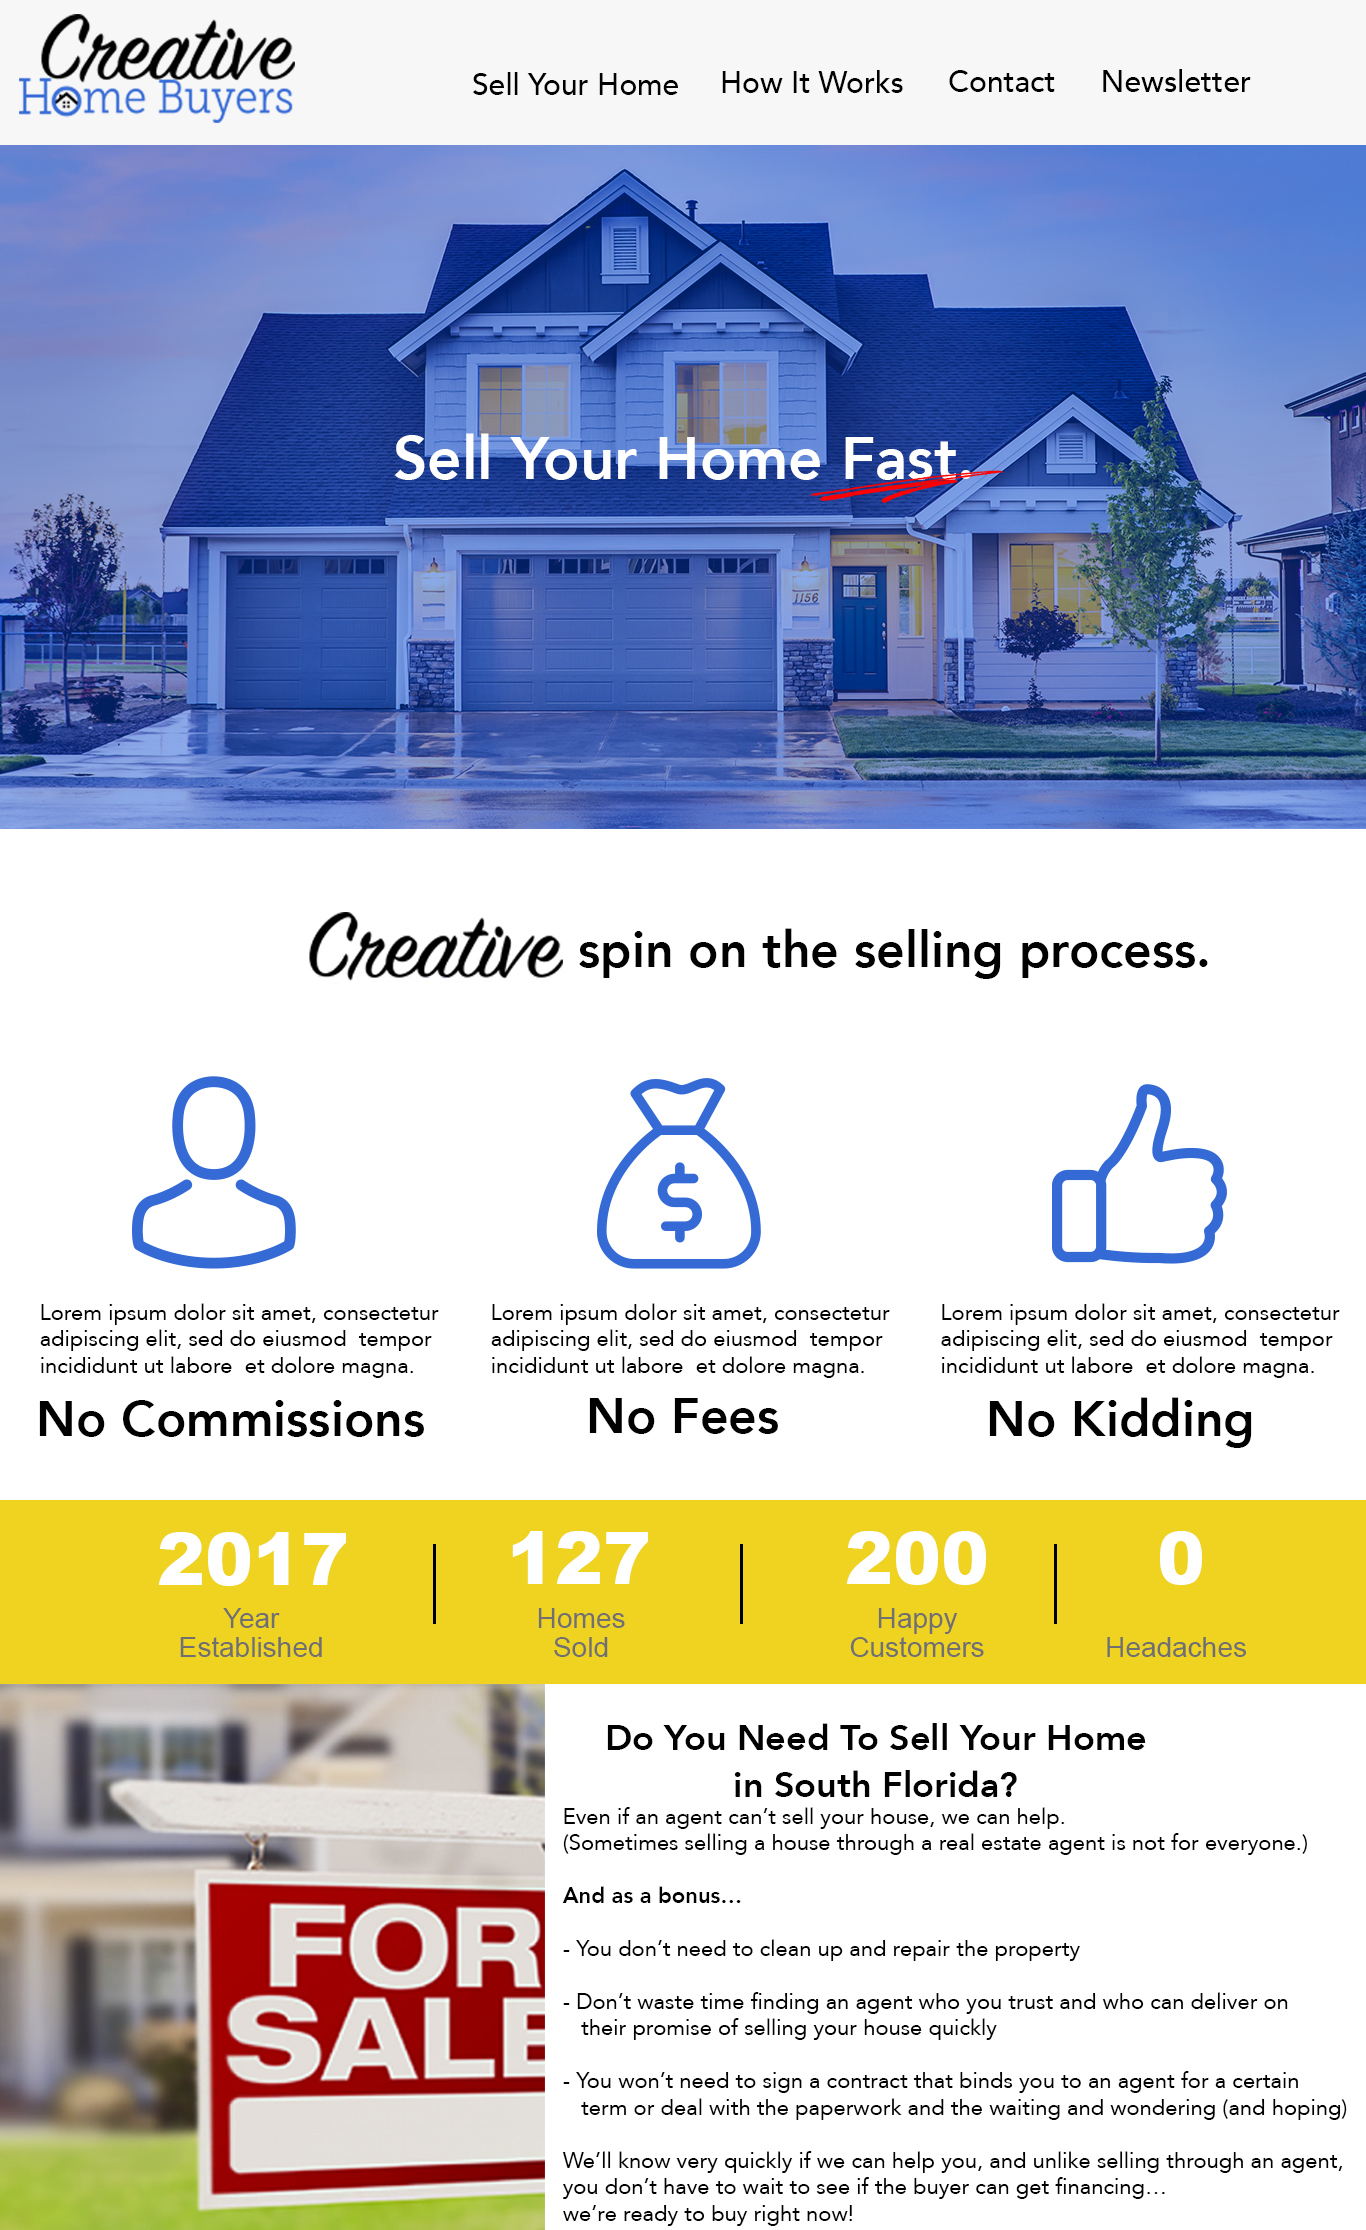 Creative Home Buyers